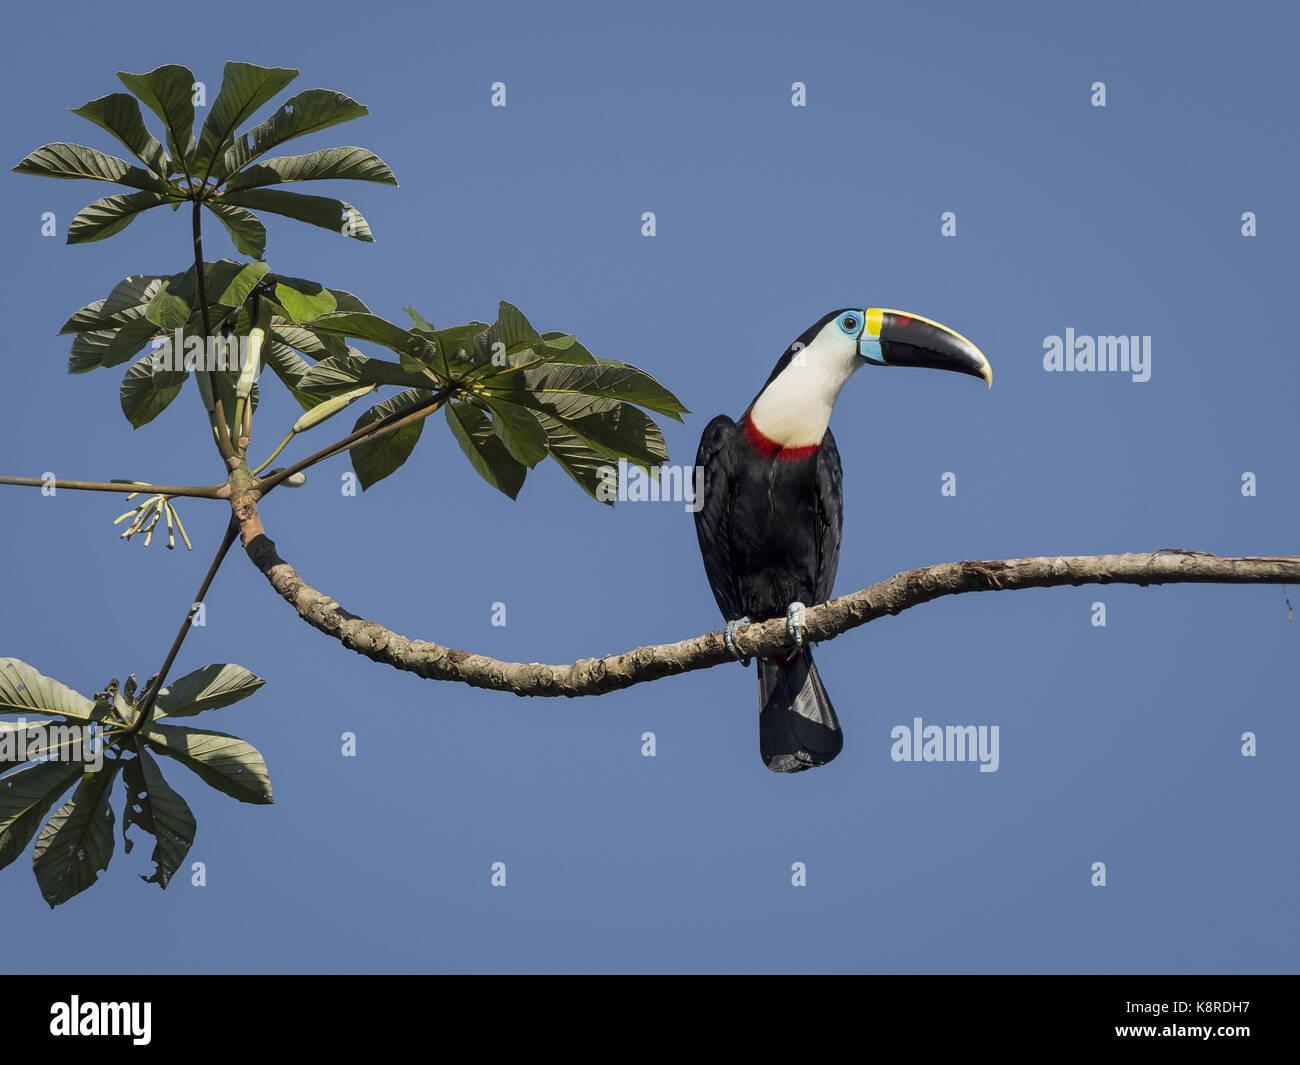 White-throated Toucan (Ramphastos tucanus), auf cecropia tree branch, Mato Grosso, Brasilien, Juni Stockbild